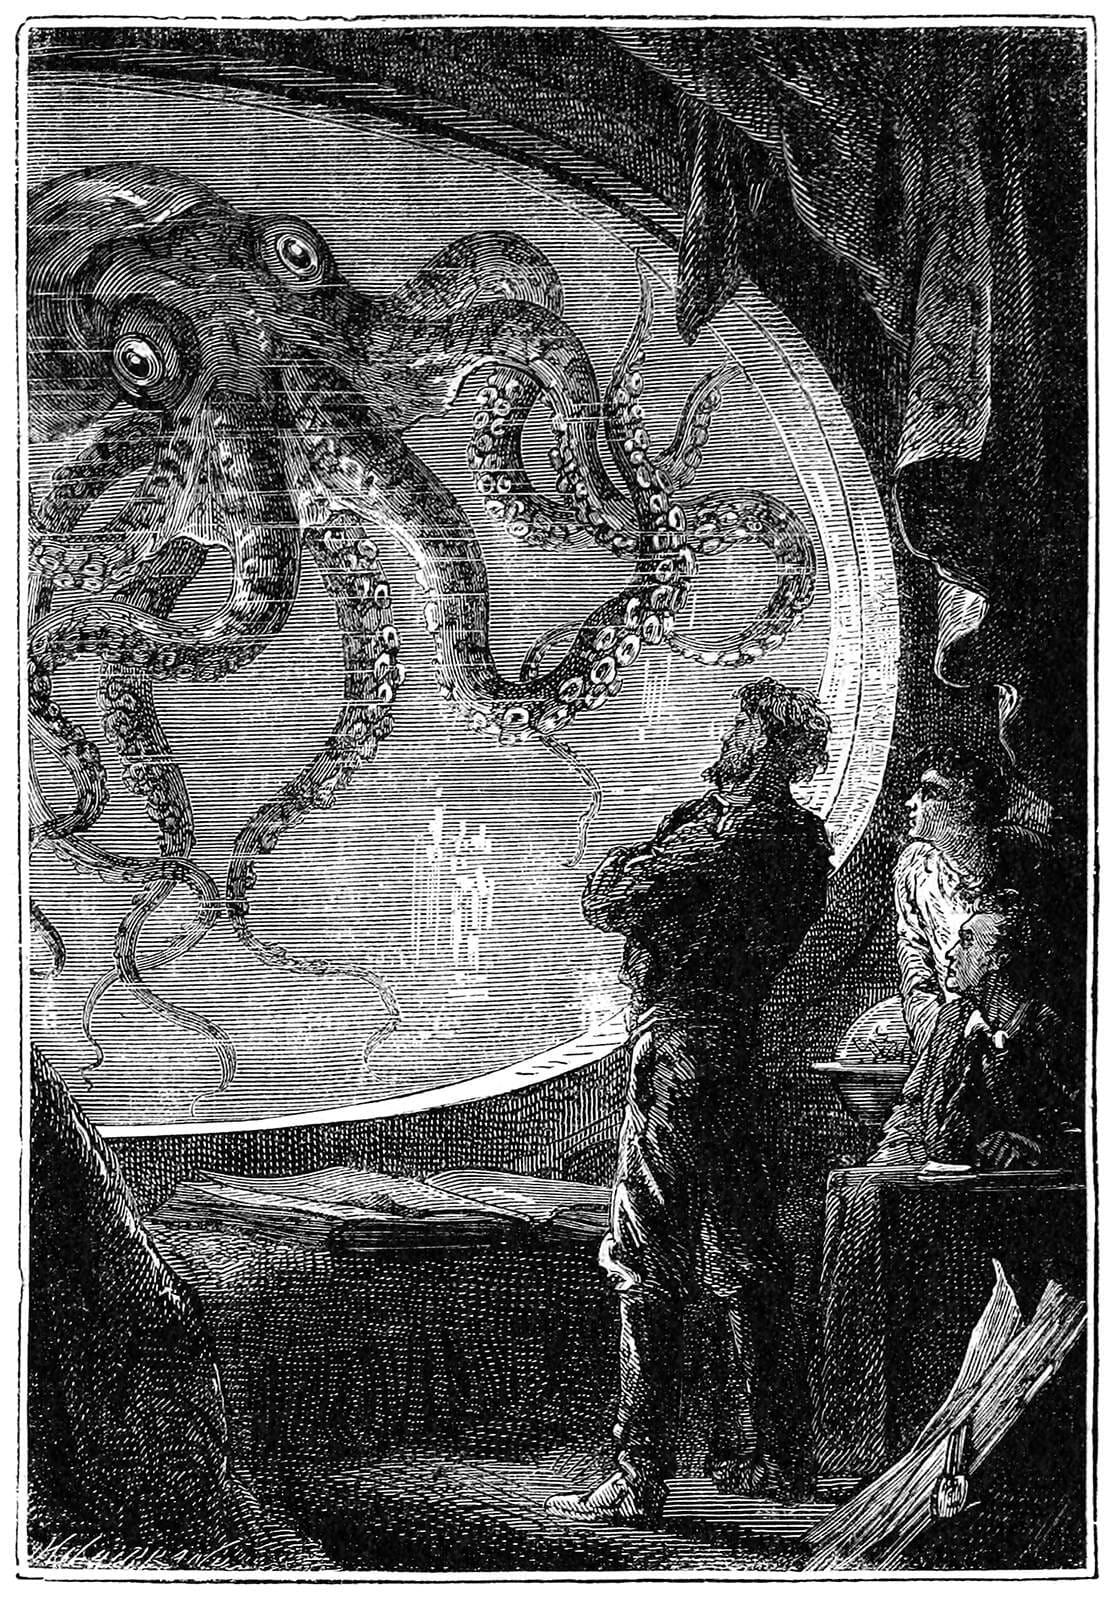 Grabado de 20.000 Leguas de Viaje Submarino, por Alphonse de Neuville